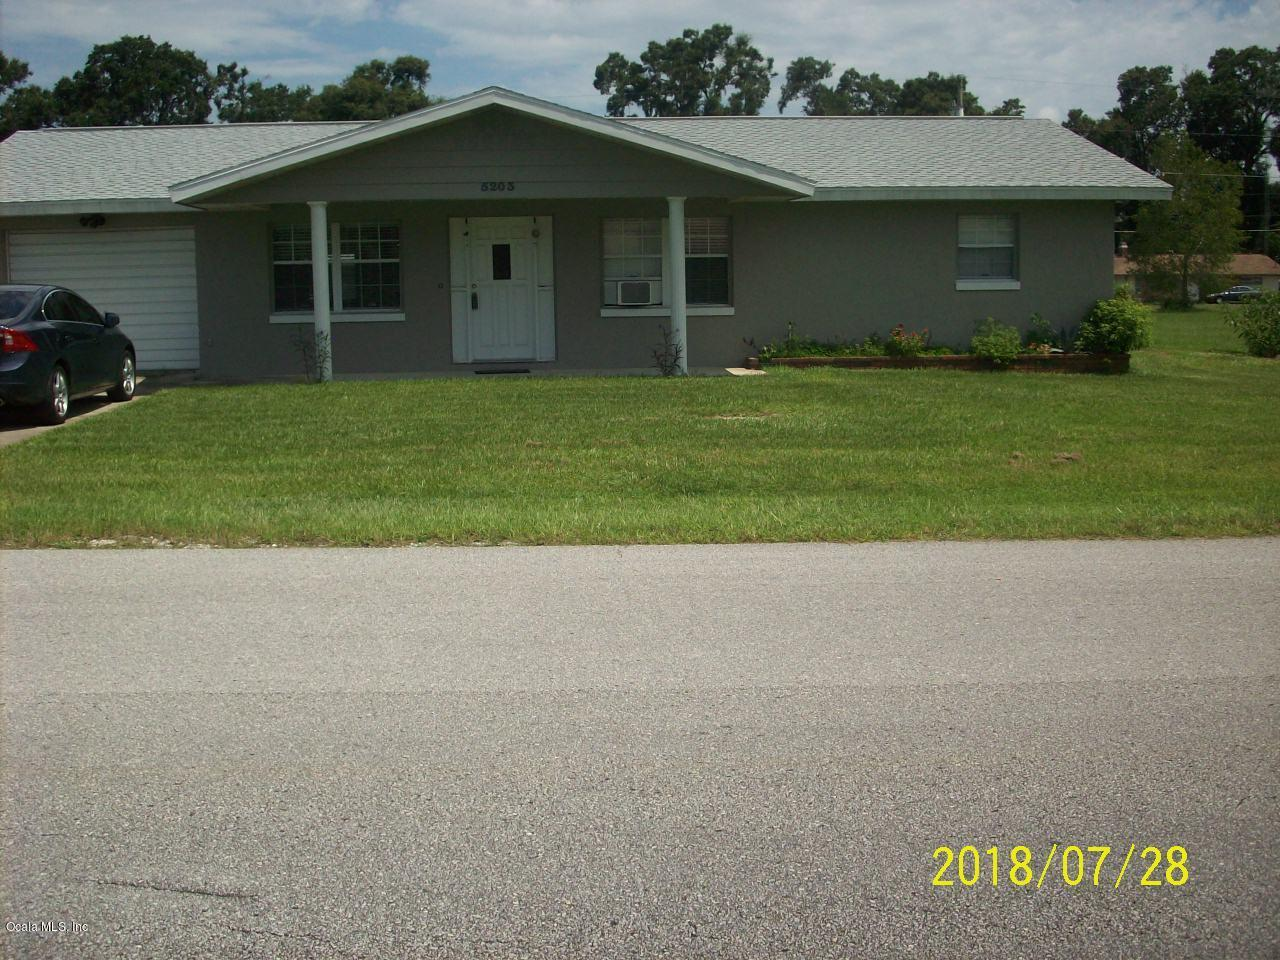 5203 SE 106TH STREET, BELLEVIEW, FL 34420